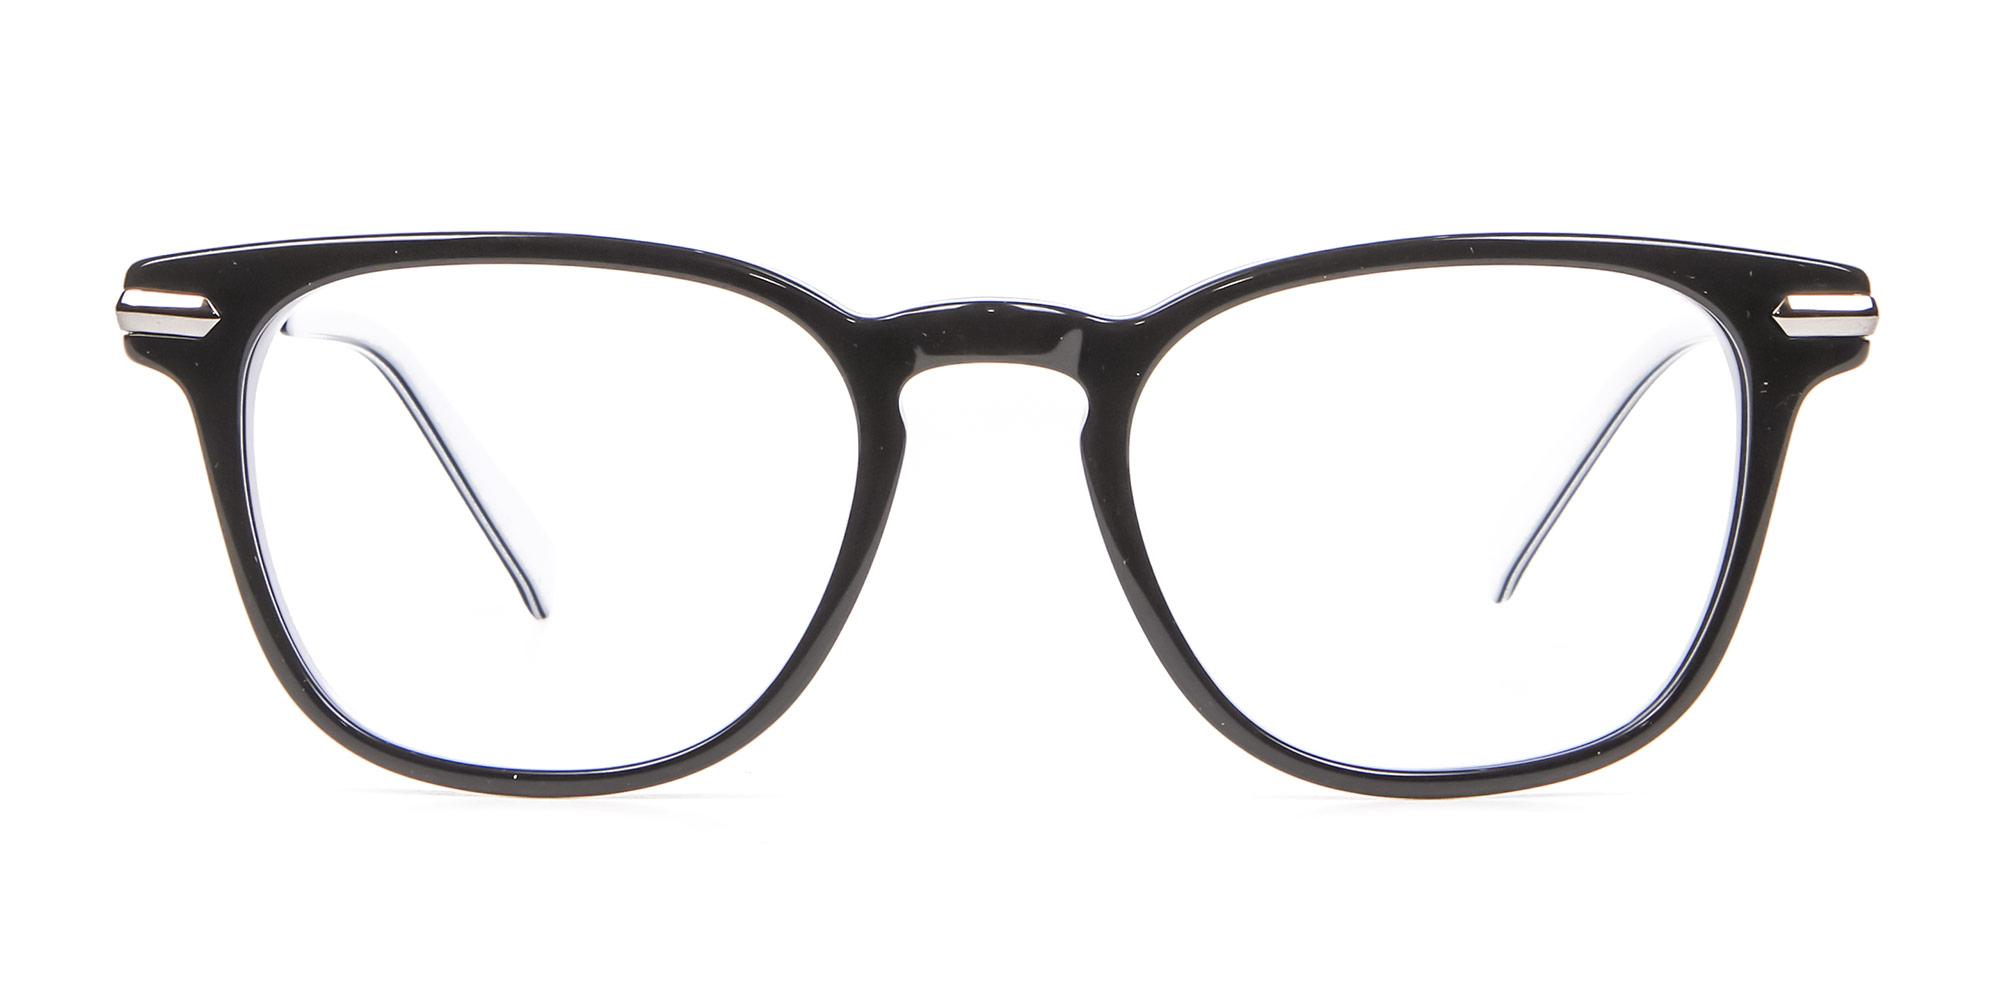 Black and White Hipster Glasses